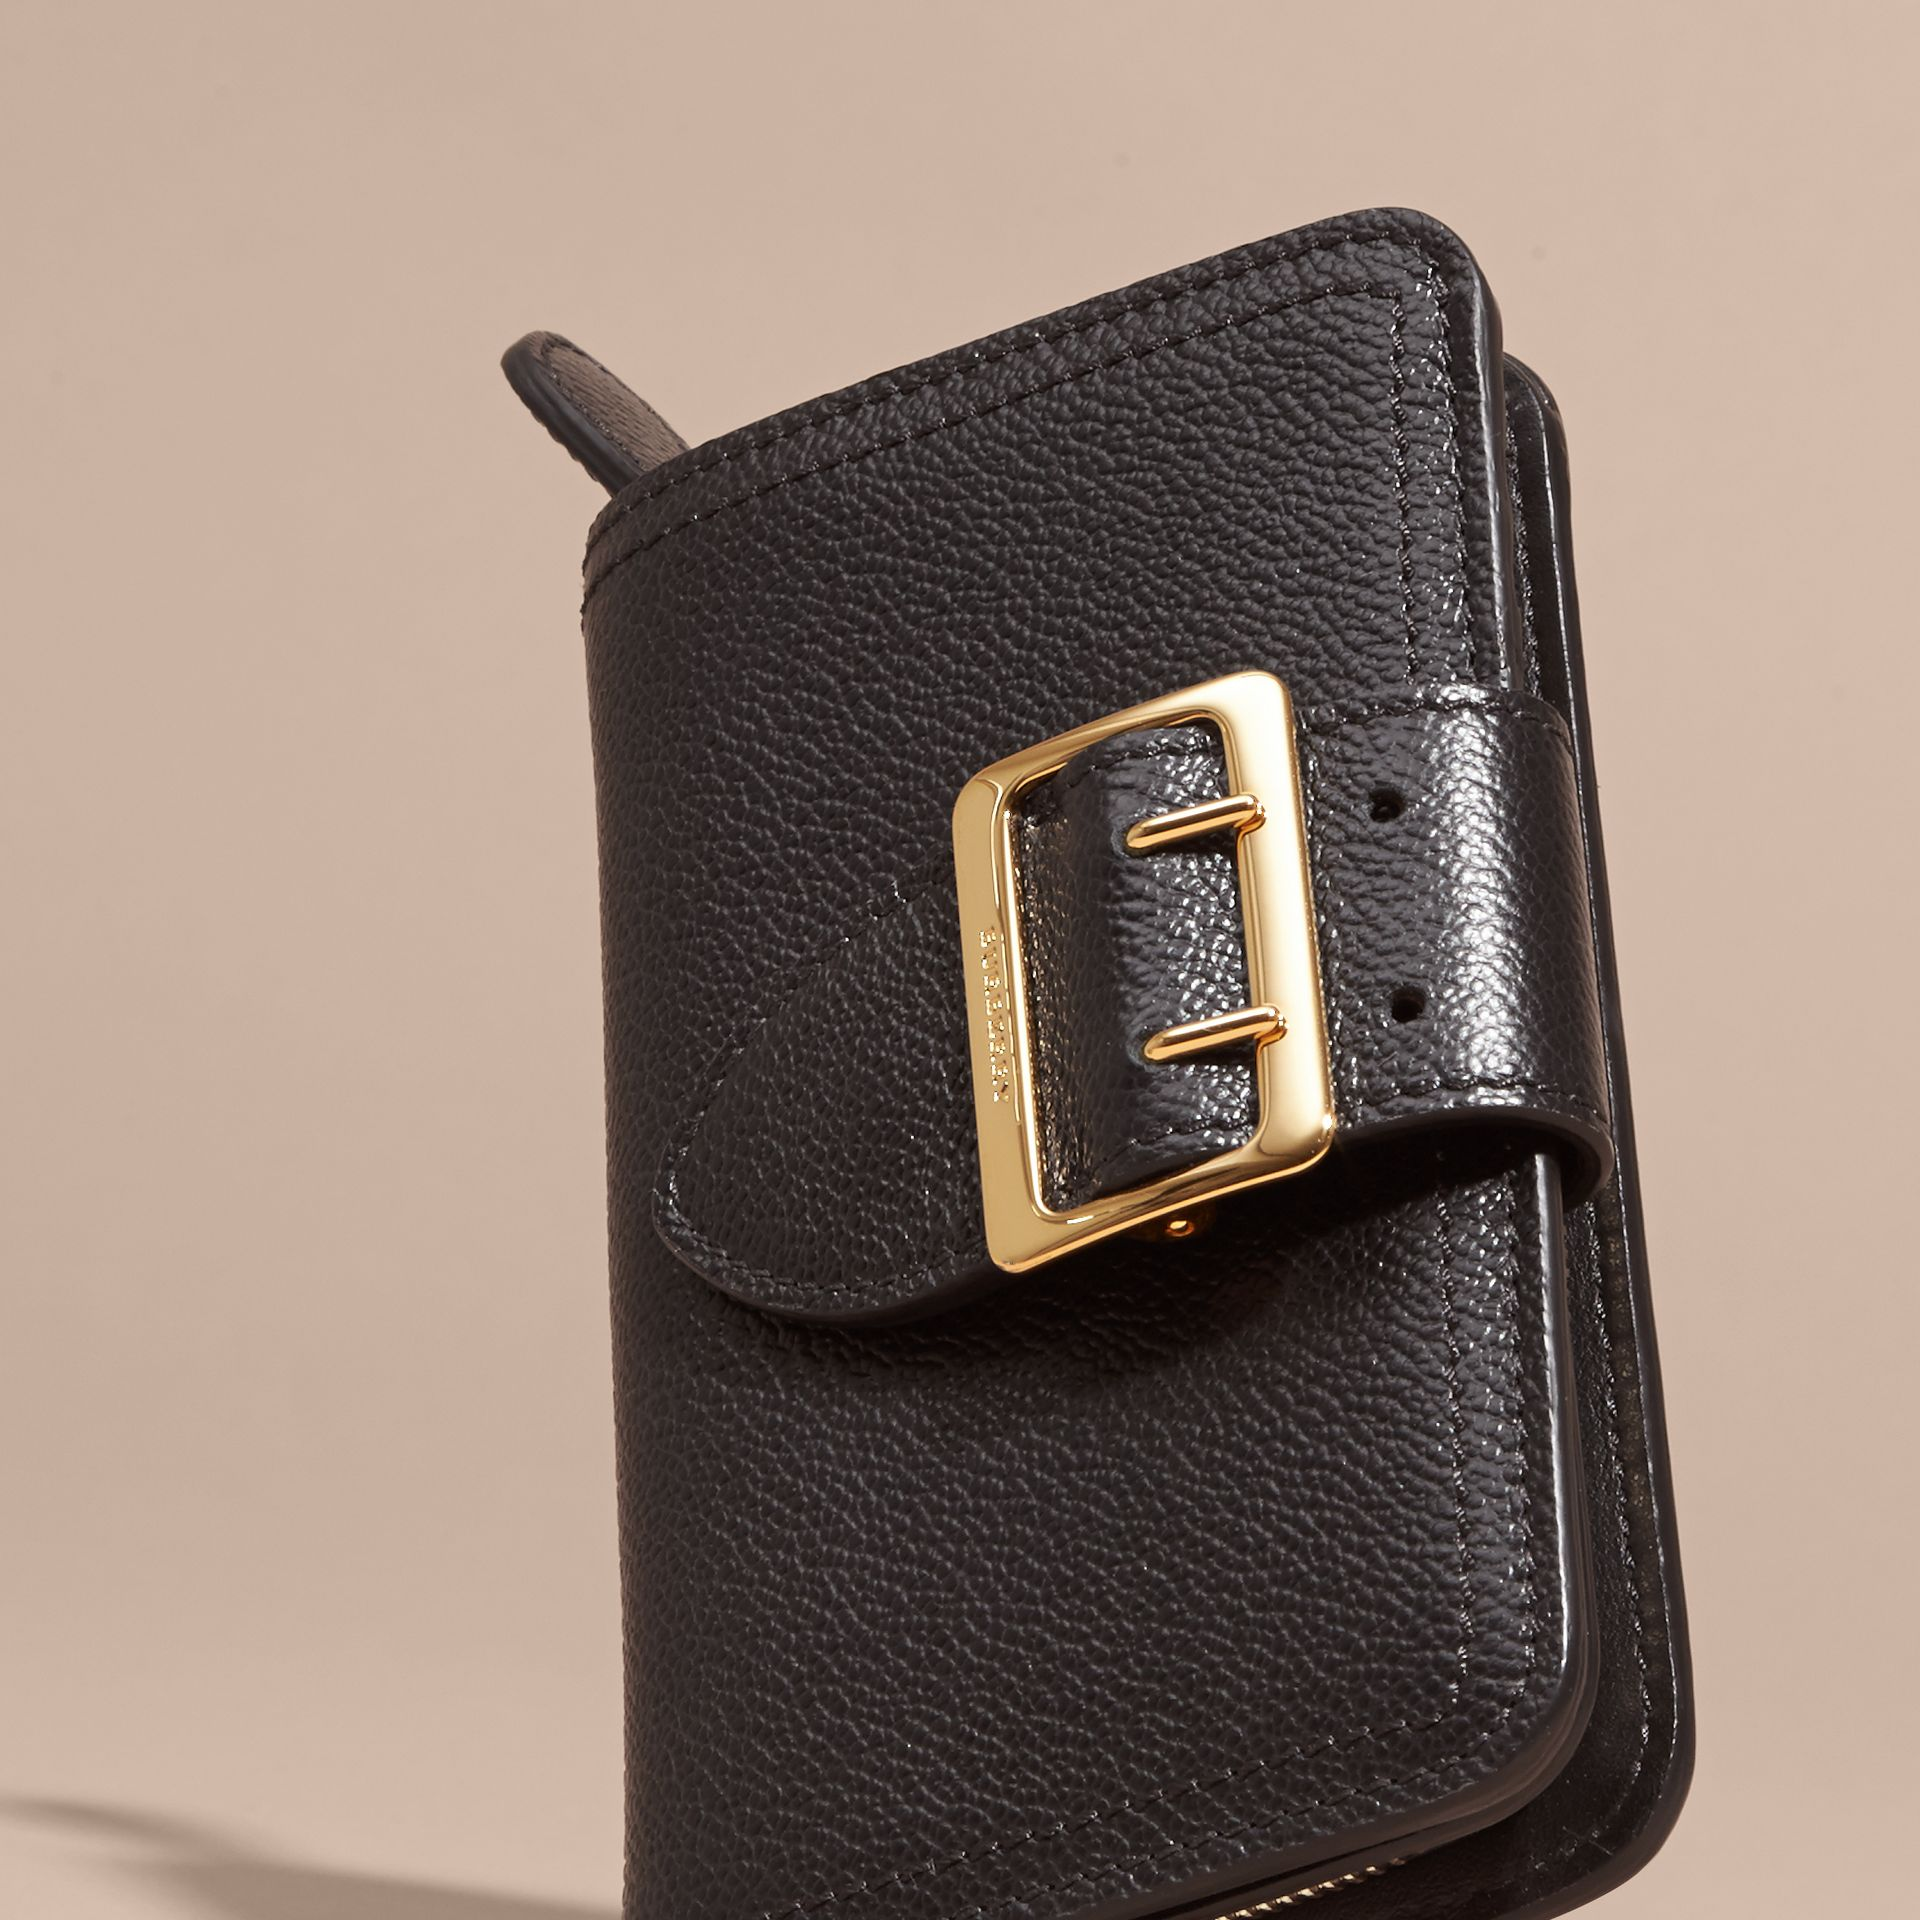 Black Buckle Detail Grainy Leather Wallet Black - gallery image 3